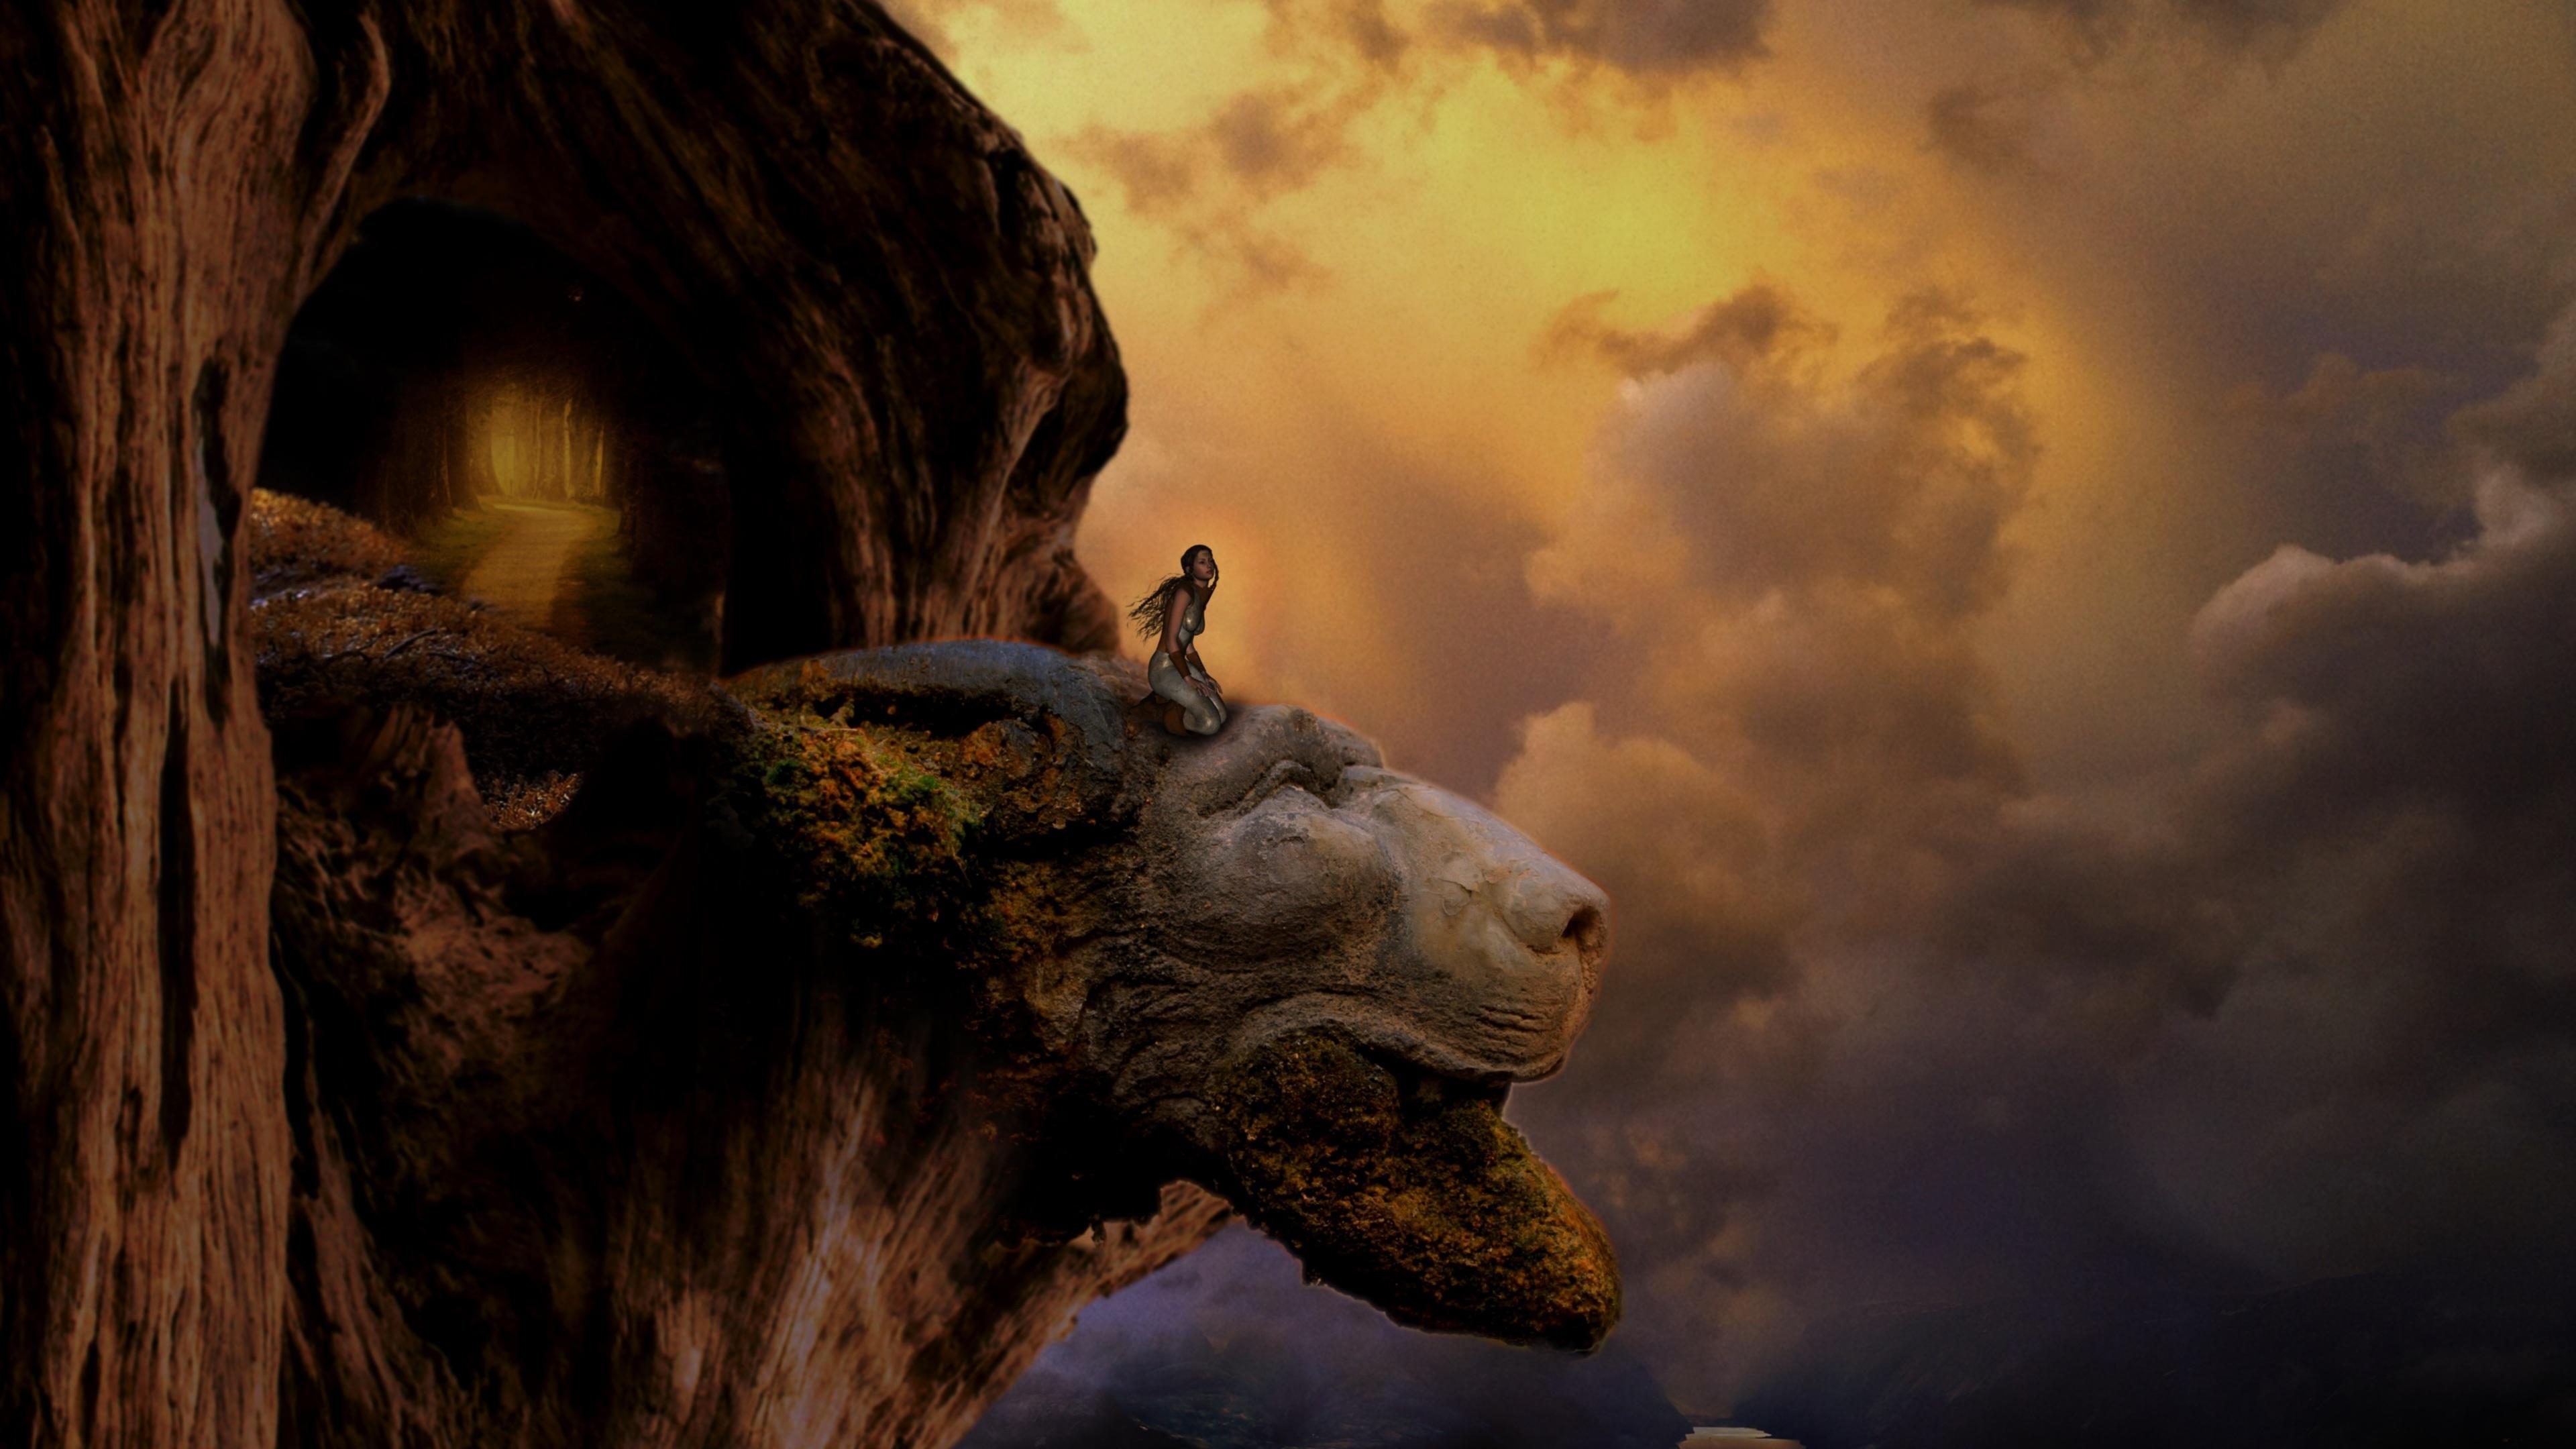 fantasy lion head artistic top view mountains 1540754361 - Fantasy Lion Head Artistic Top View Mountains - hd-wallpapers, fantasy wallpapers, dreamy wallpapers, artist wallpapers, 4k-wallpapers